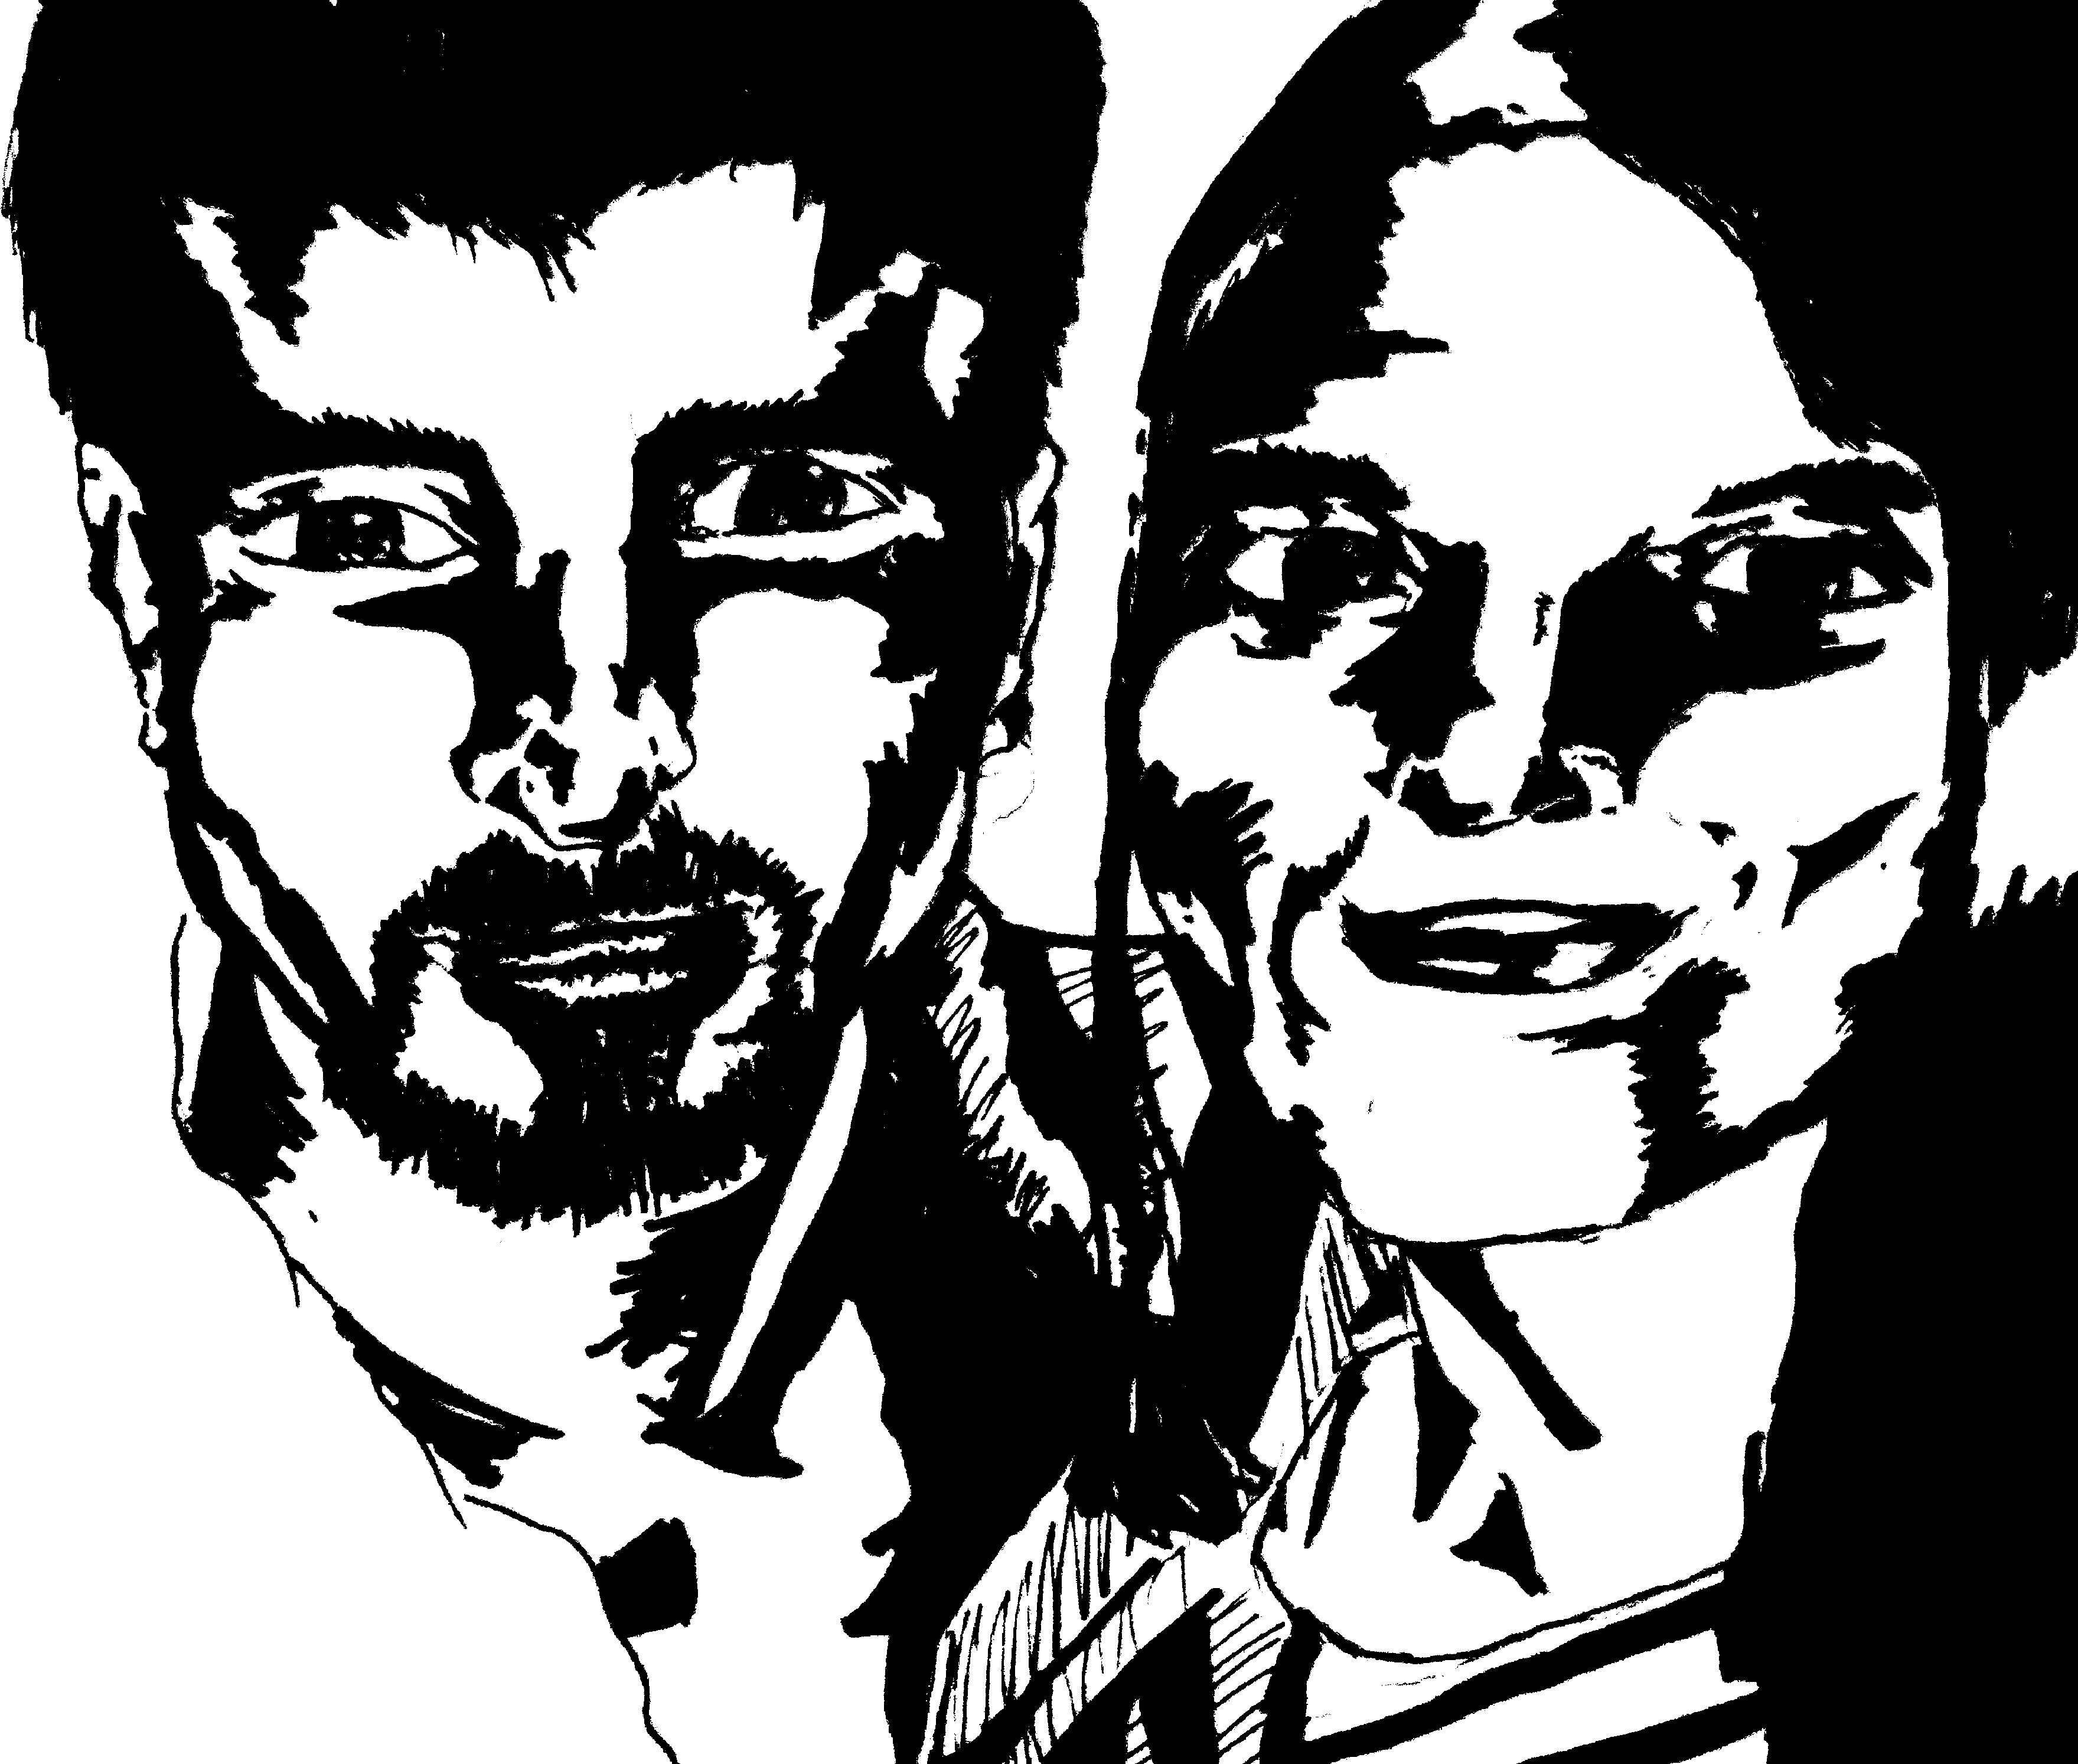 Portrait Inking, comic style.